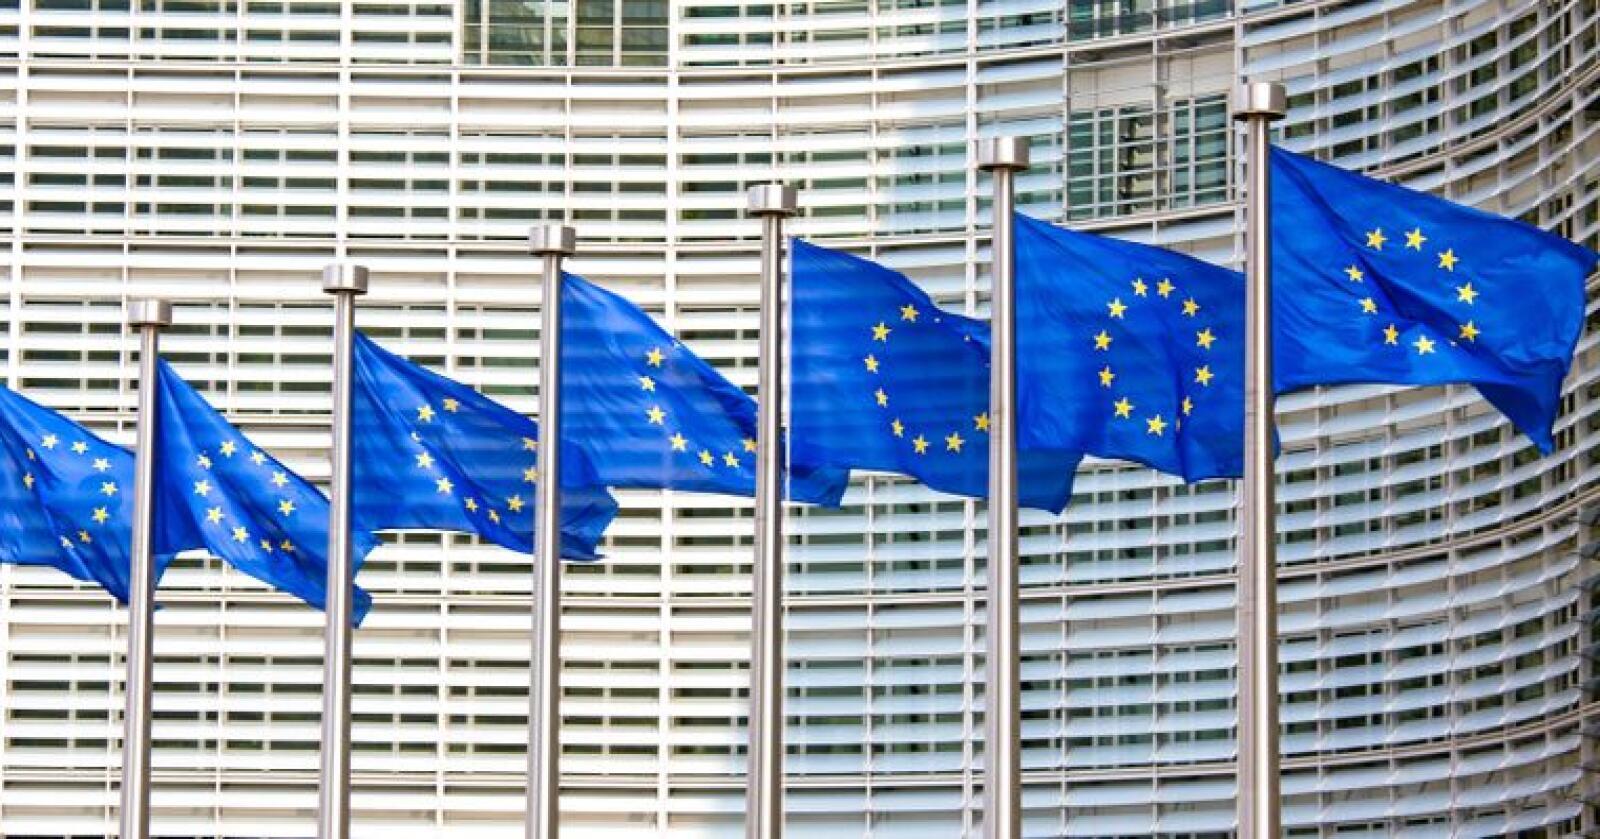 Medlemsstatene i EØS har totalt 212 pågående overtredelsessaker. Foto: Mostphotos